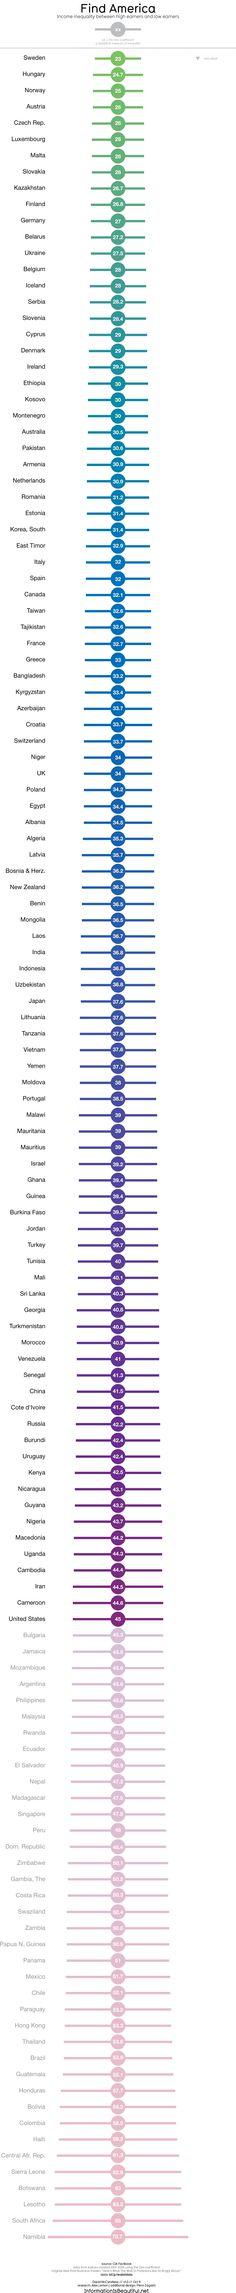 Income inequality around the world.